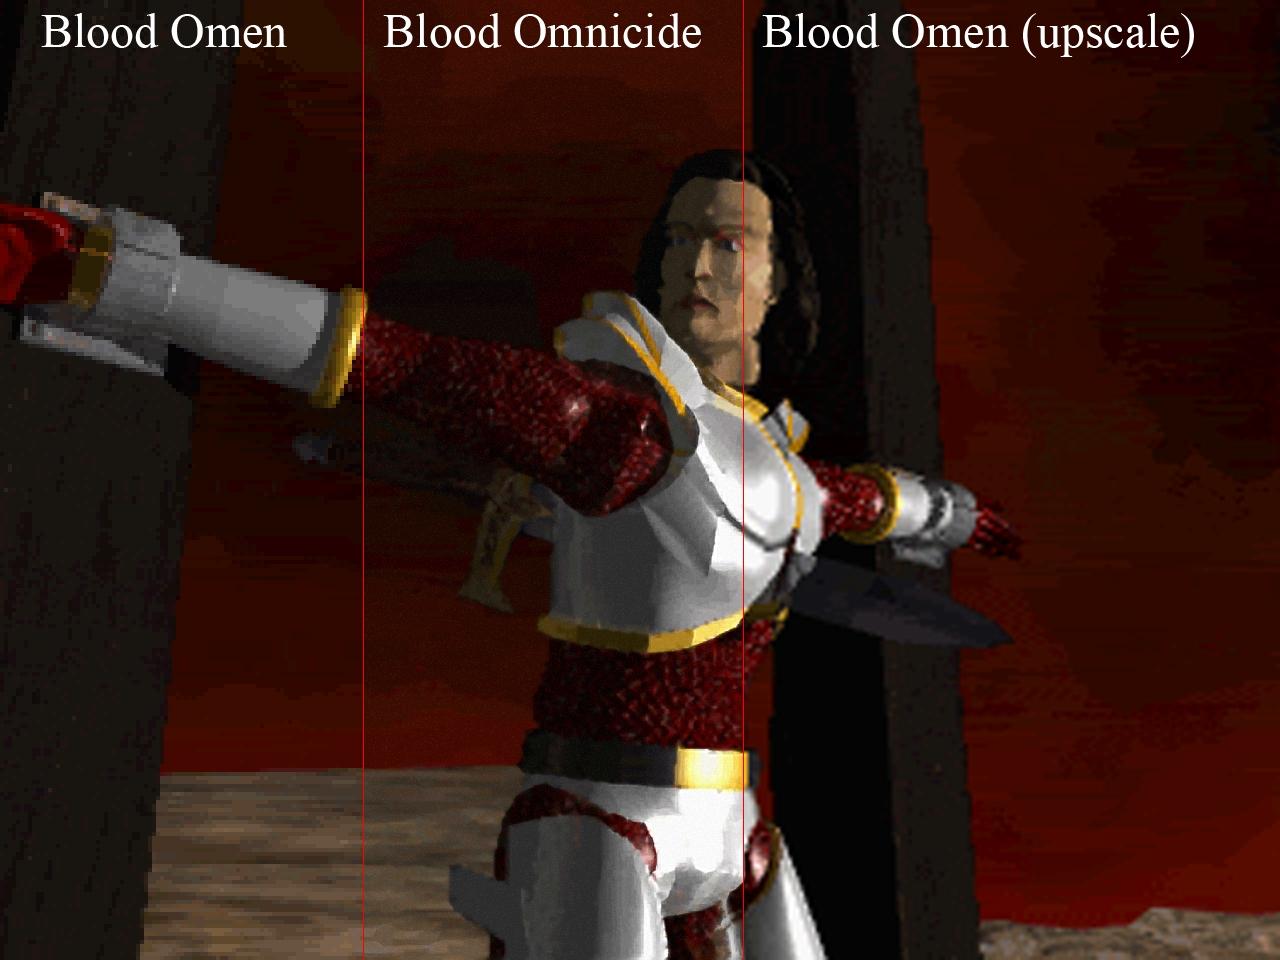 Blood omen porno xxx films